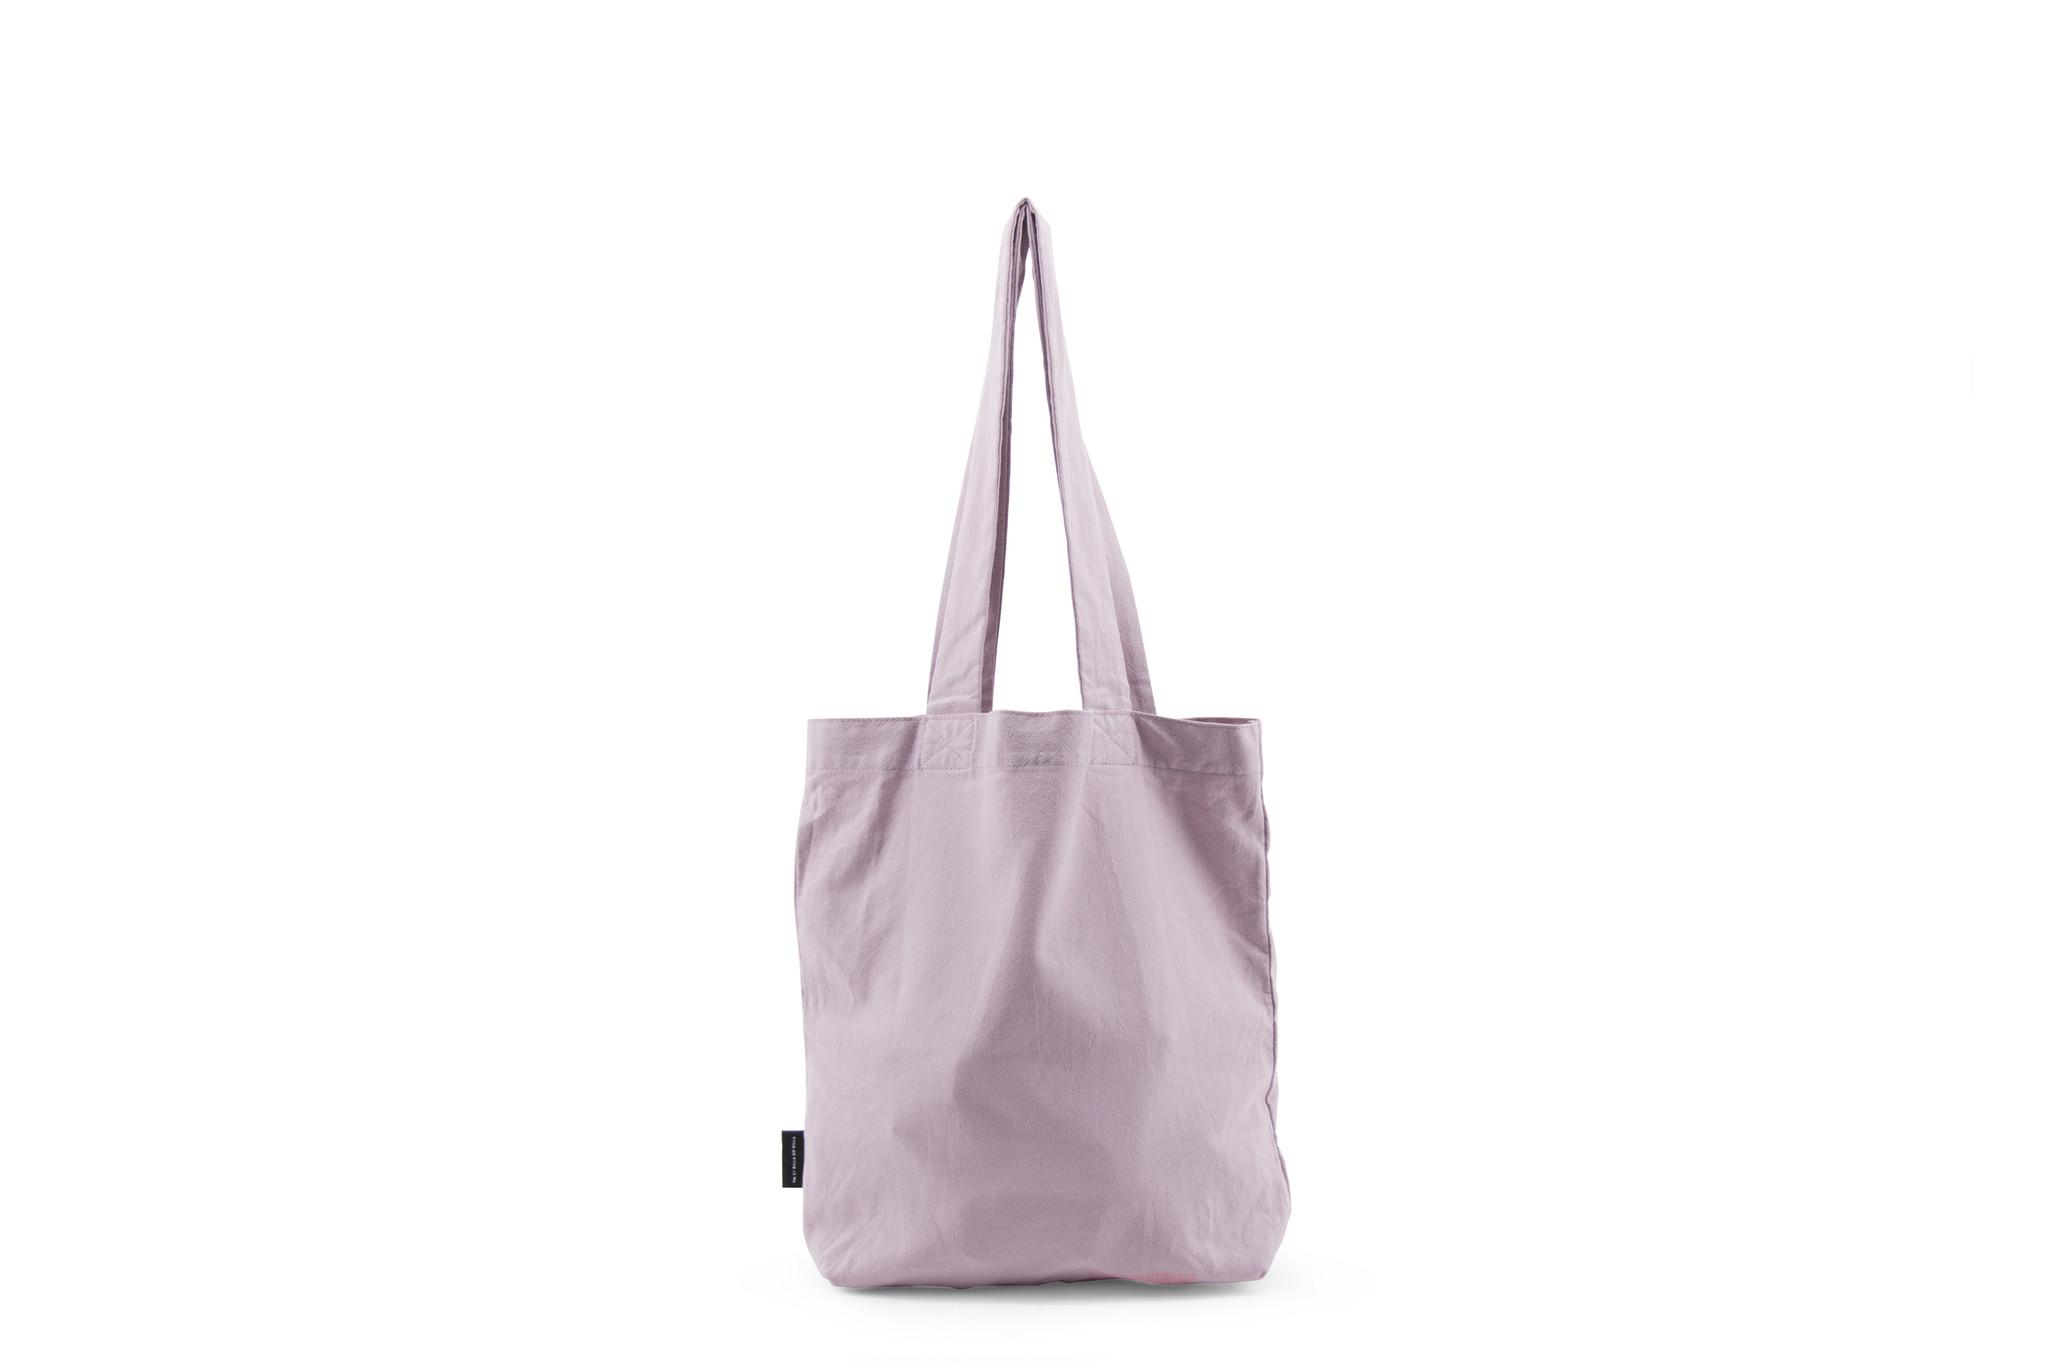 F.G. Tote Bag Linen - Orchid Hush-3